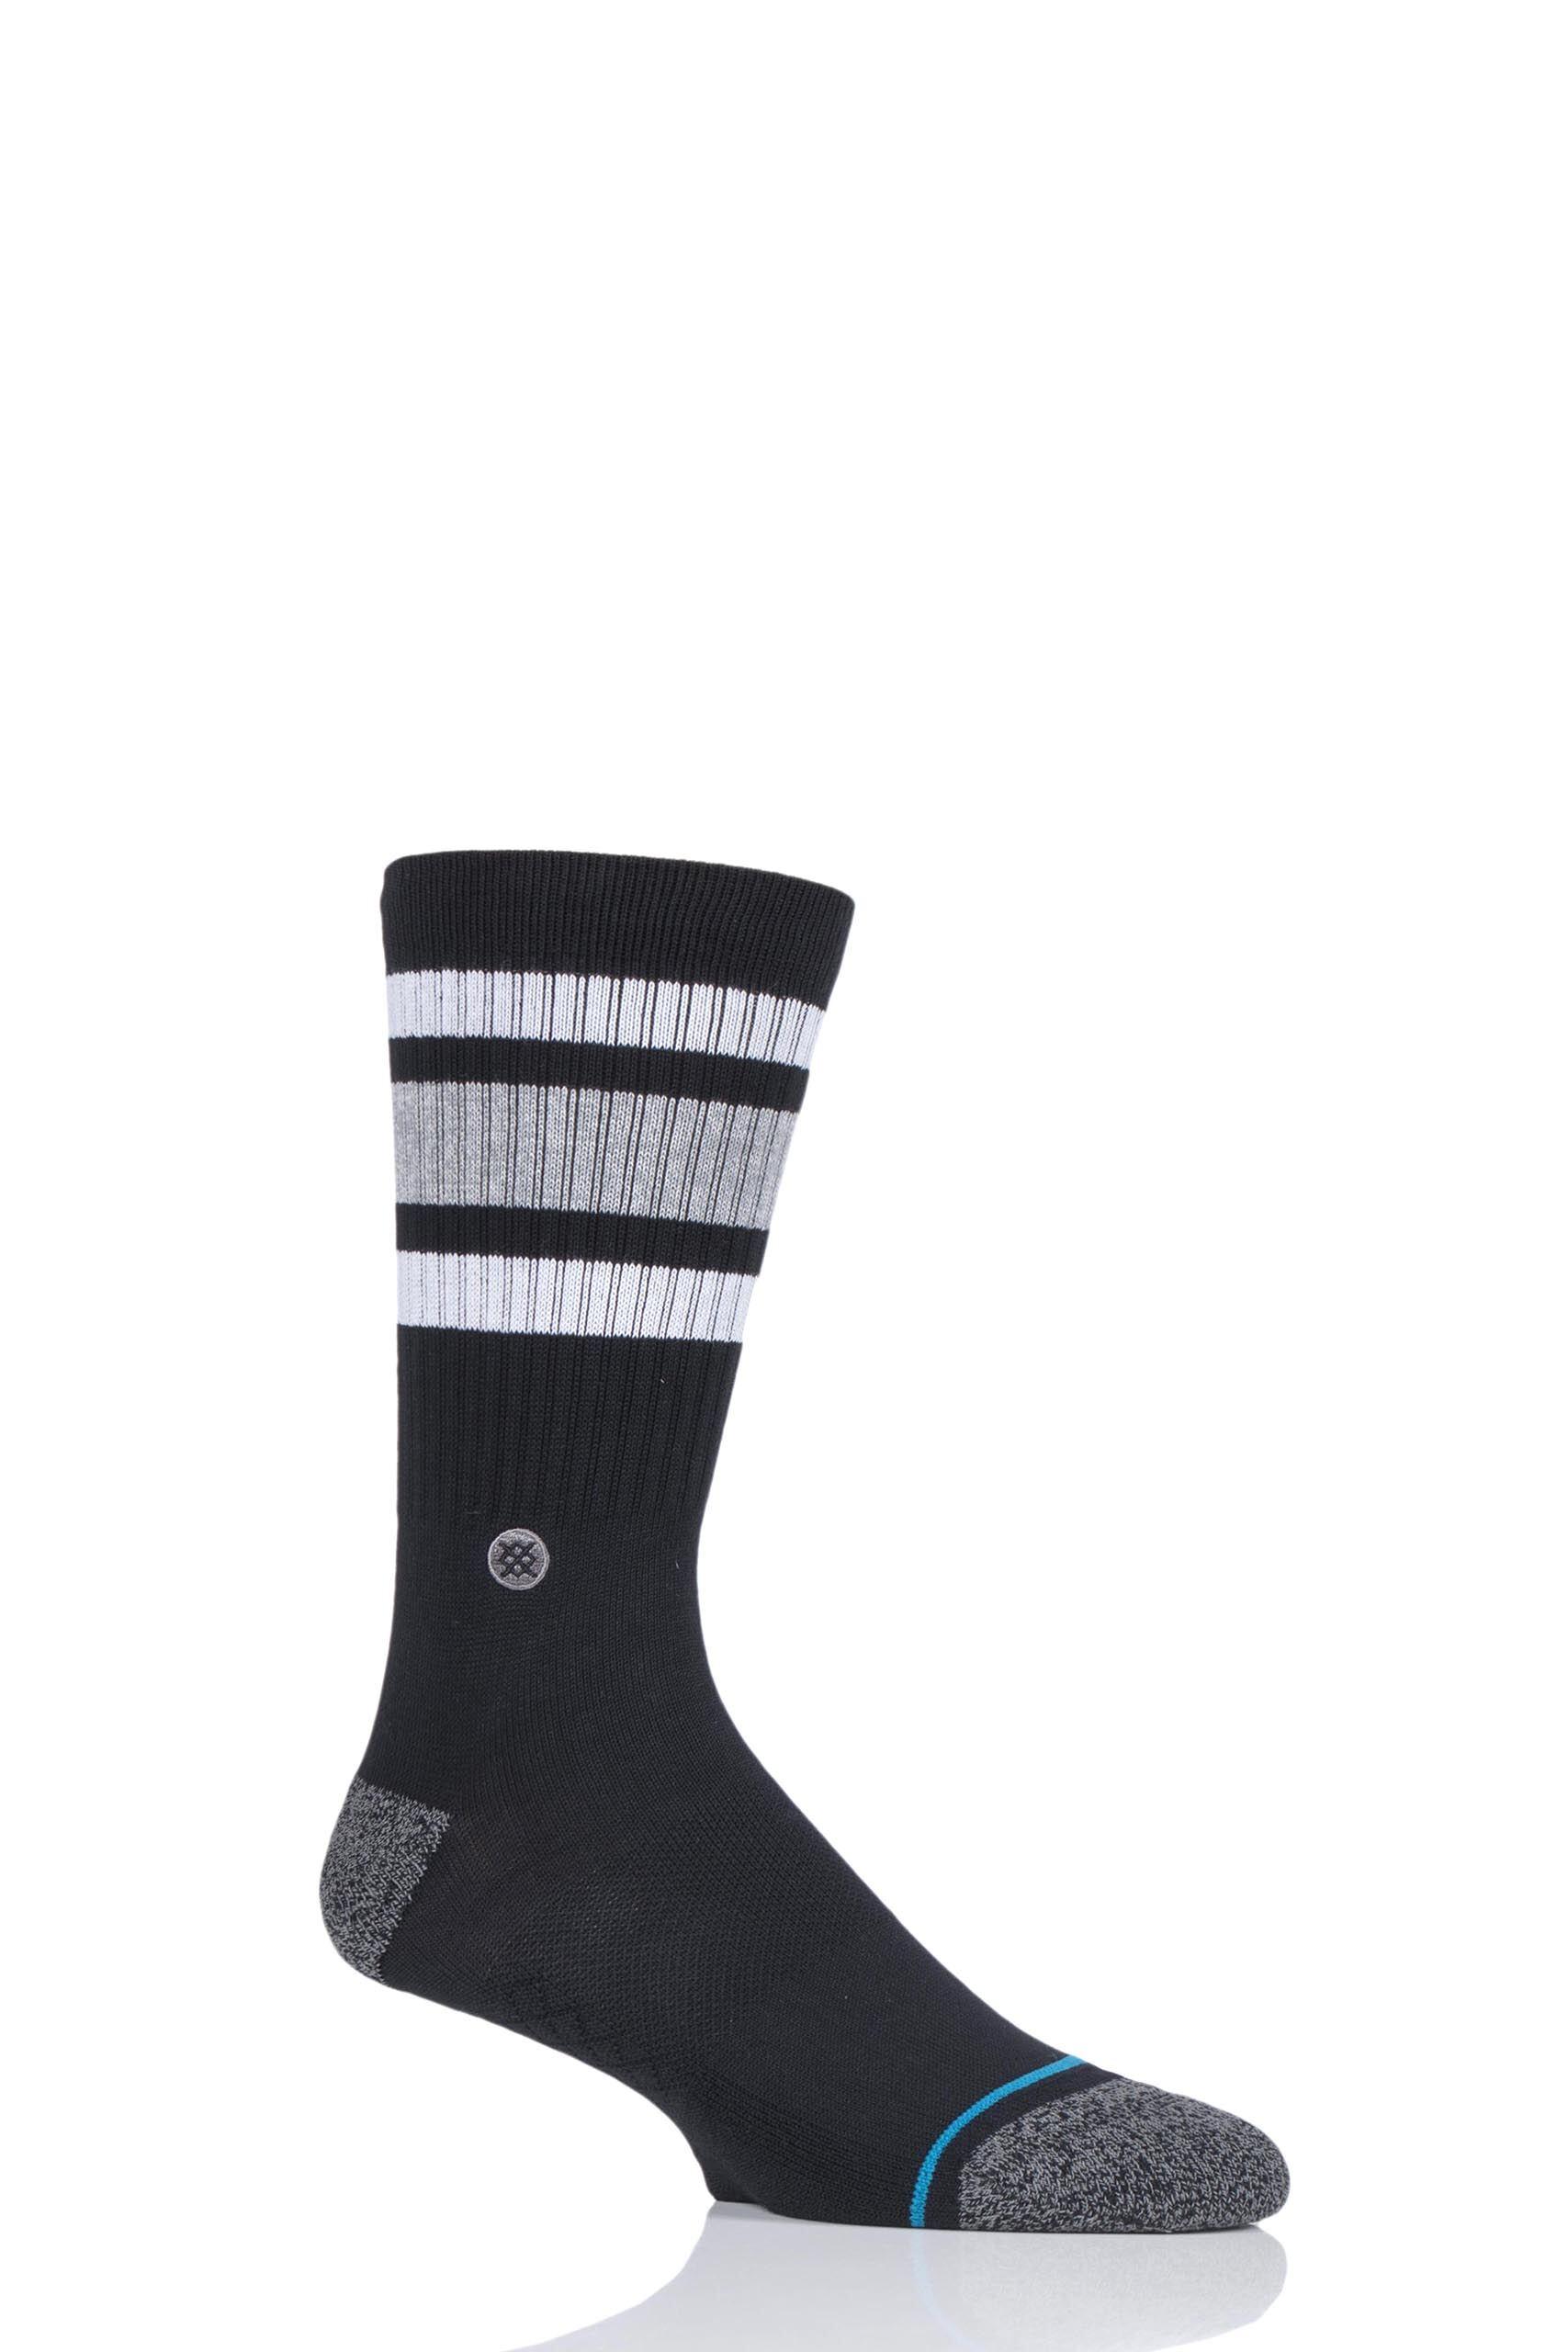 Image of 1 Pair Black Boyd St Cotton Socks Unisex 8.5-11.5 Mens - Stance